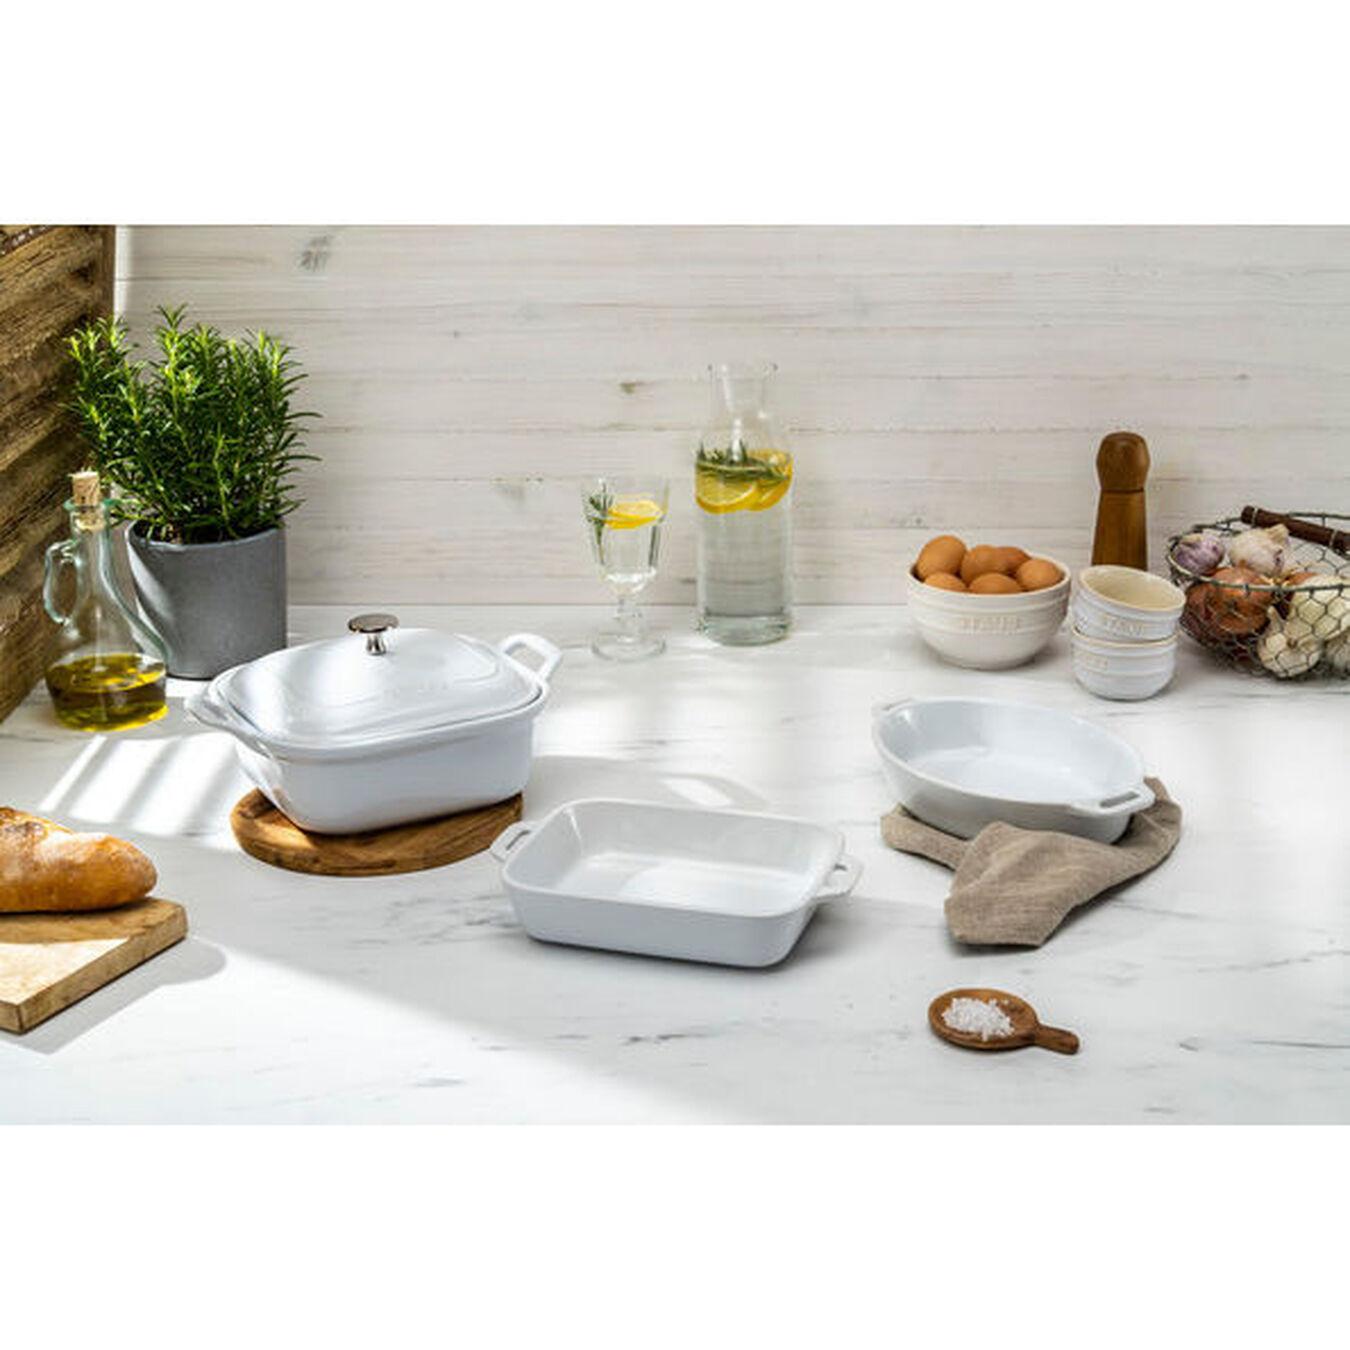 Ovenware set, 4 Piece | white,,large 7